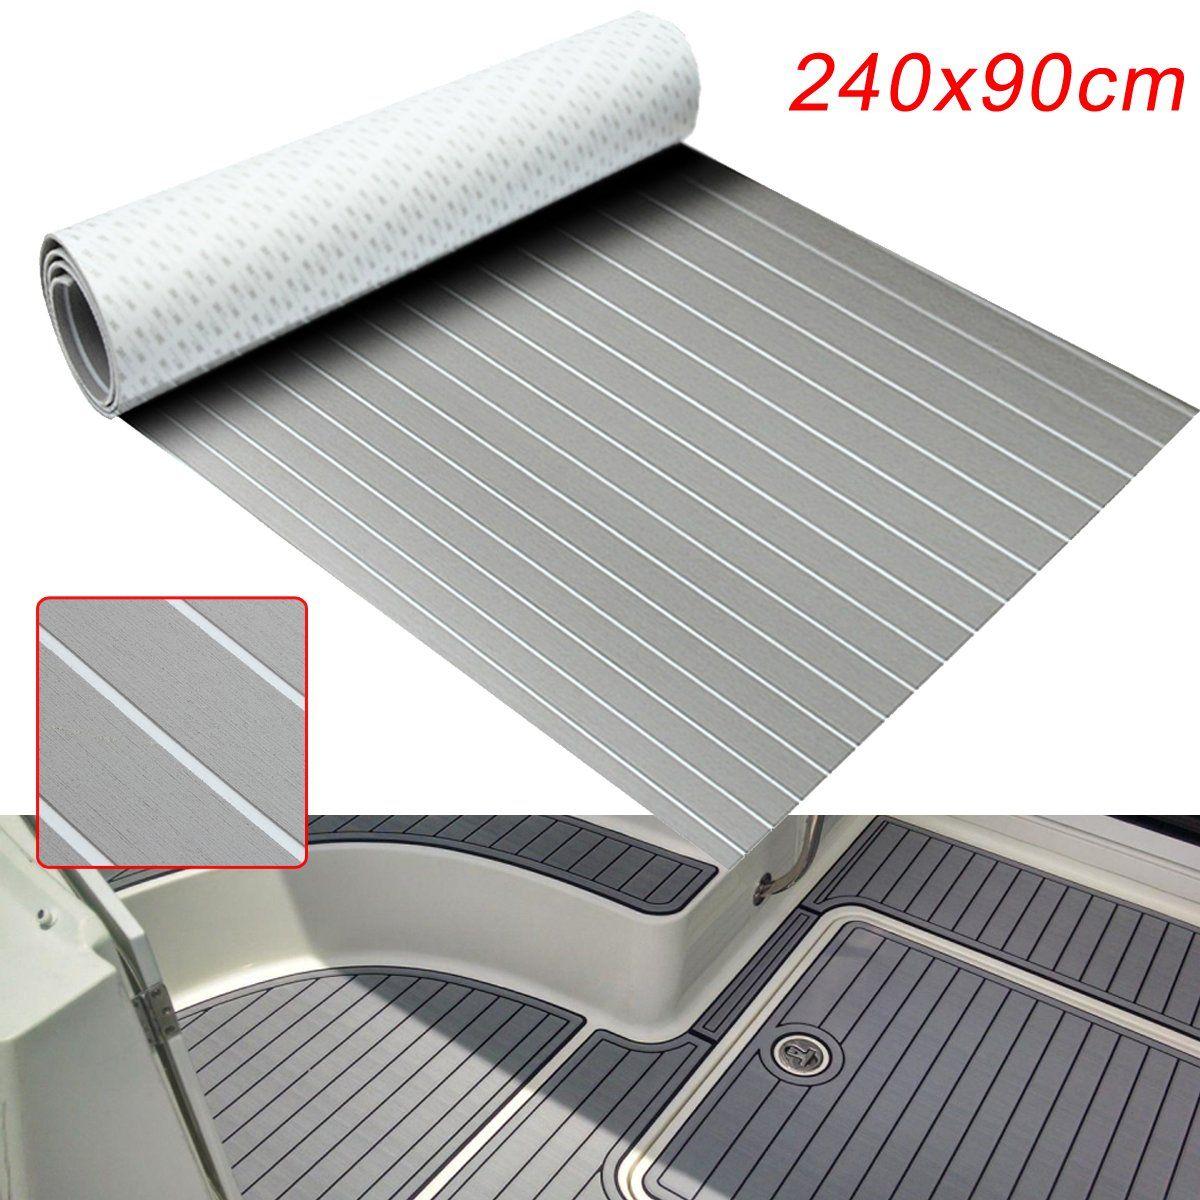 240cmx90cmx5mm Marine Flooring Faux Teak Grey With White